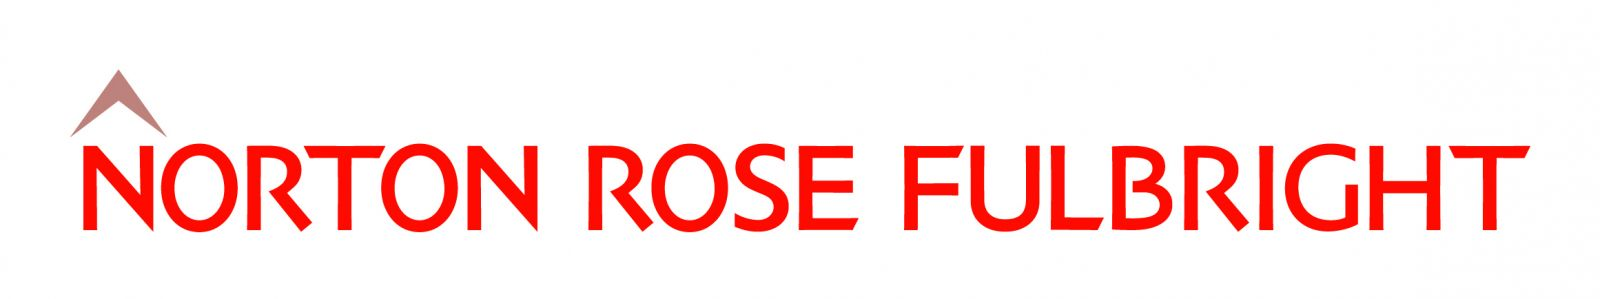 Norton-Rose-Fulbright.jpg